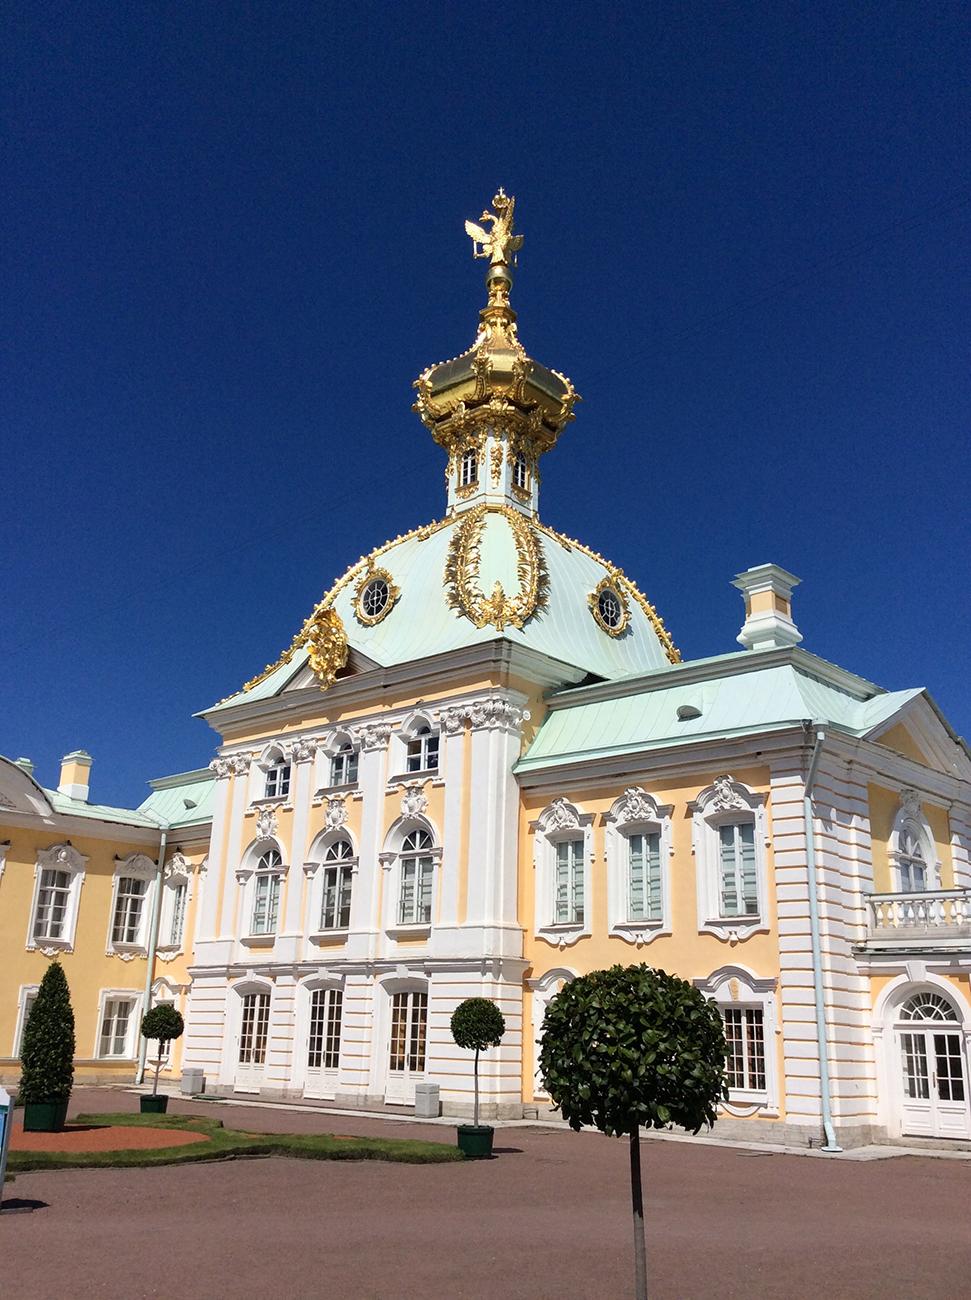 Built between 1714-1723, the Peterhof Palace in Saint